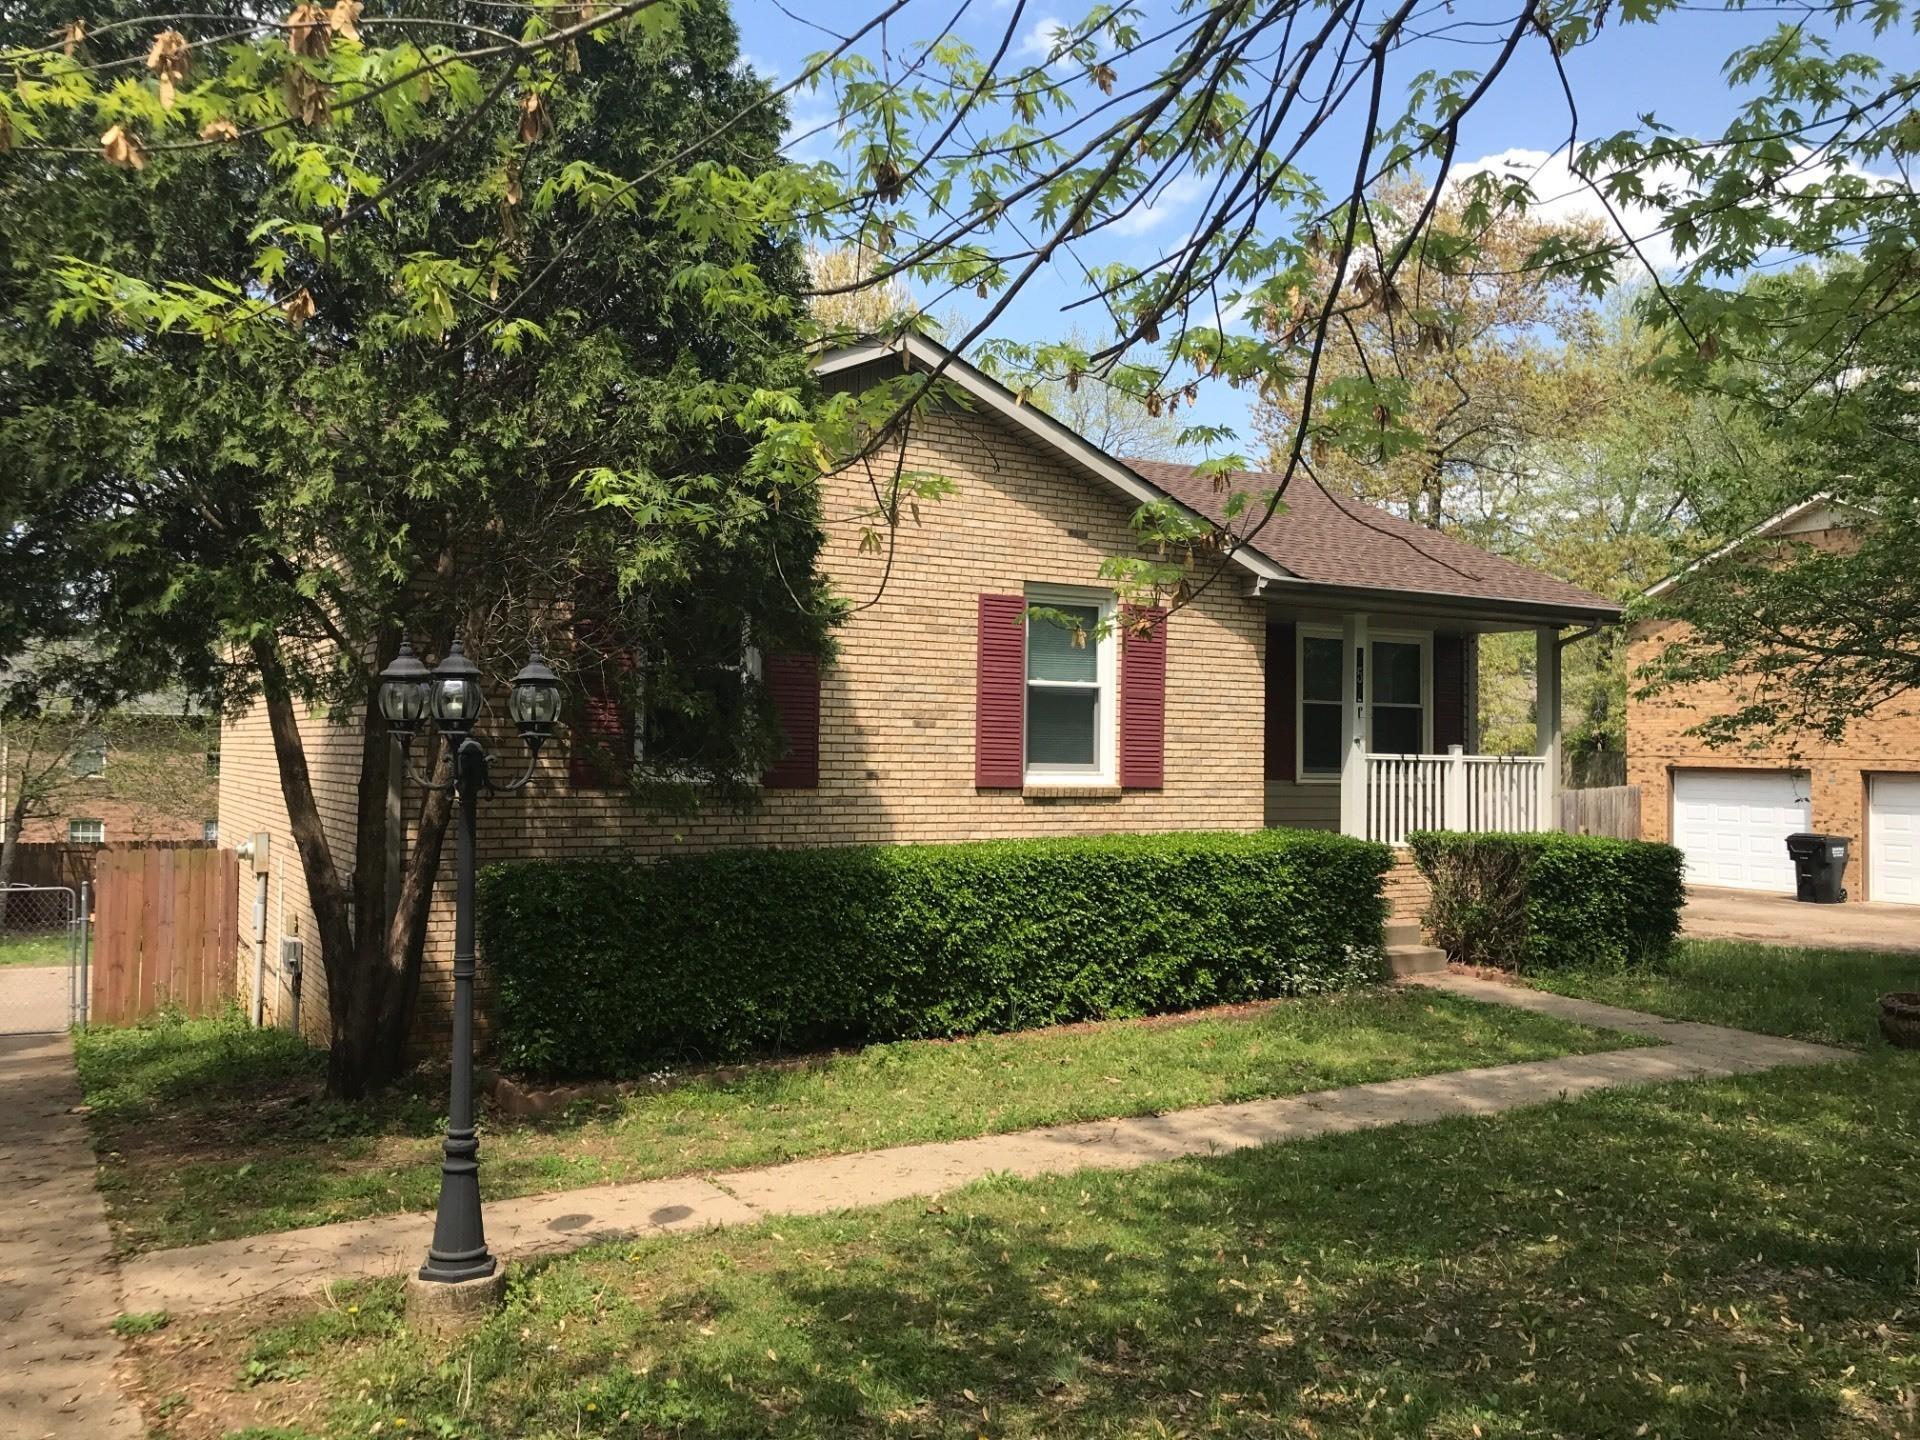 252 Millstone Cir Property Photo - Clarksville, TN real estate listing